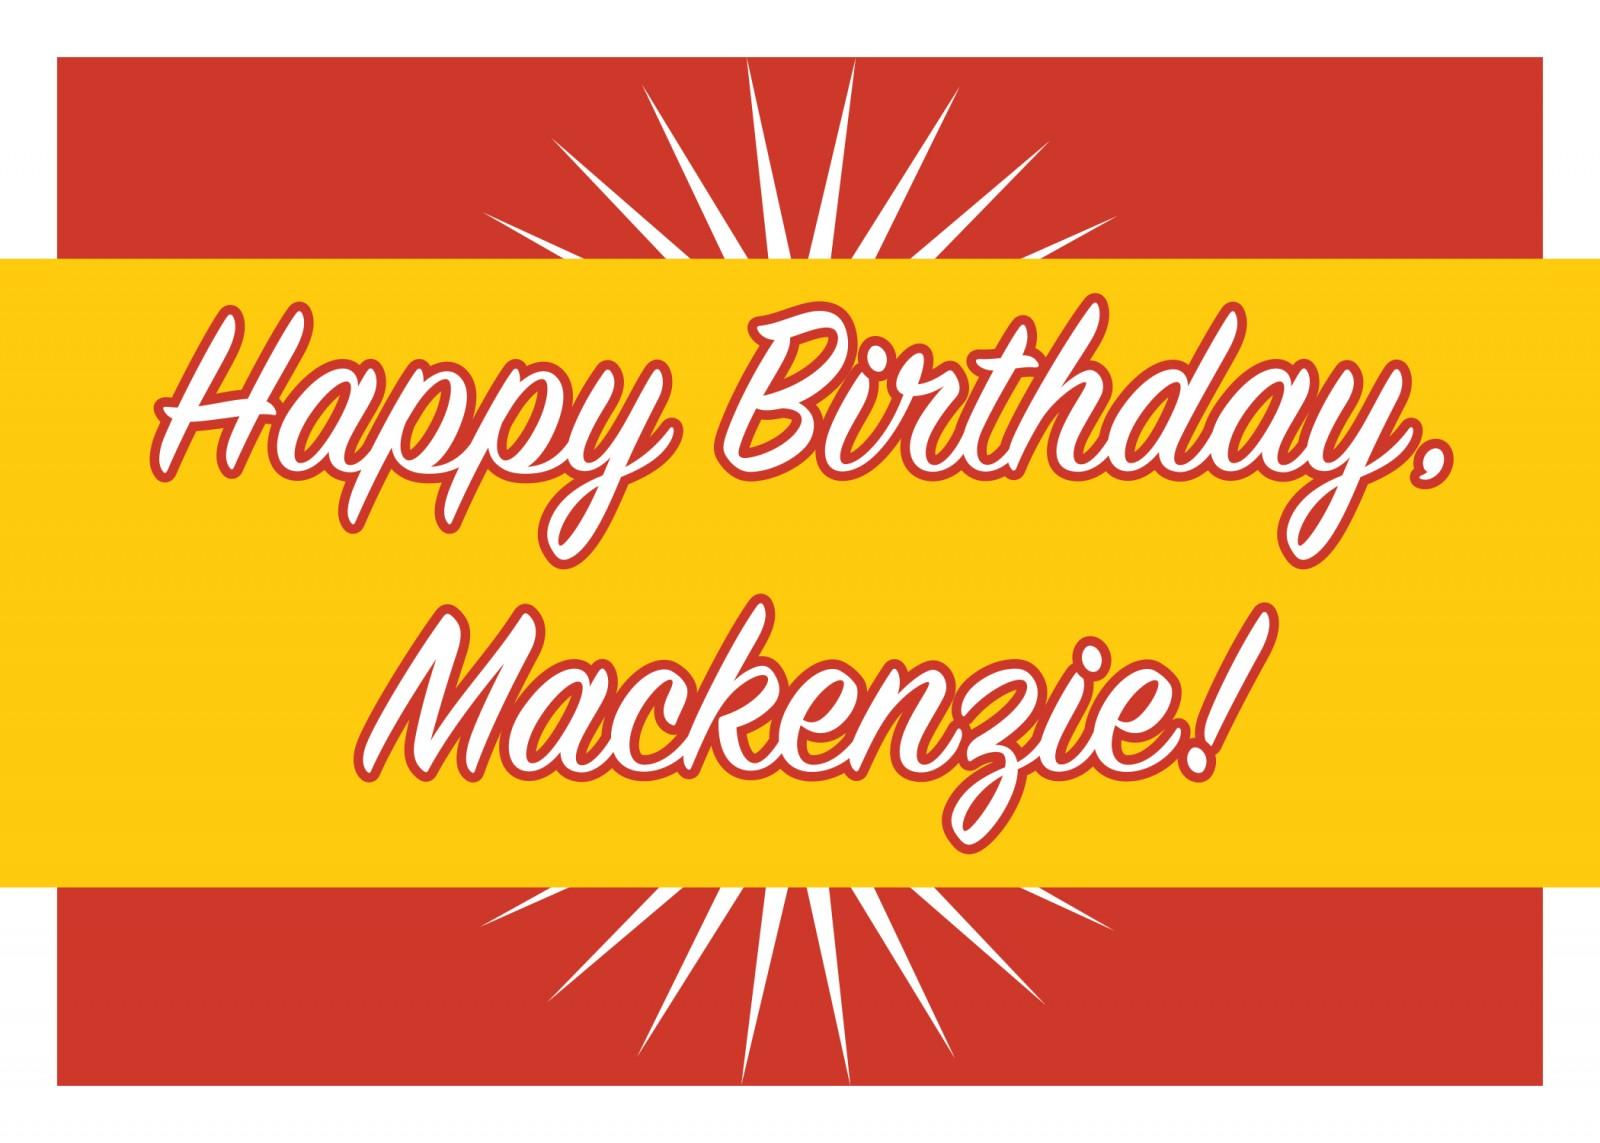 happy birthday  mackenzie  - officenters